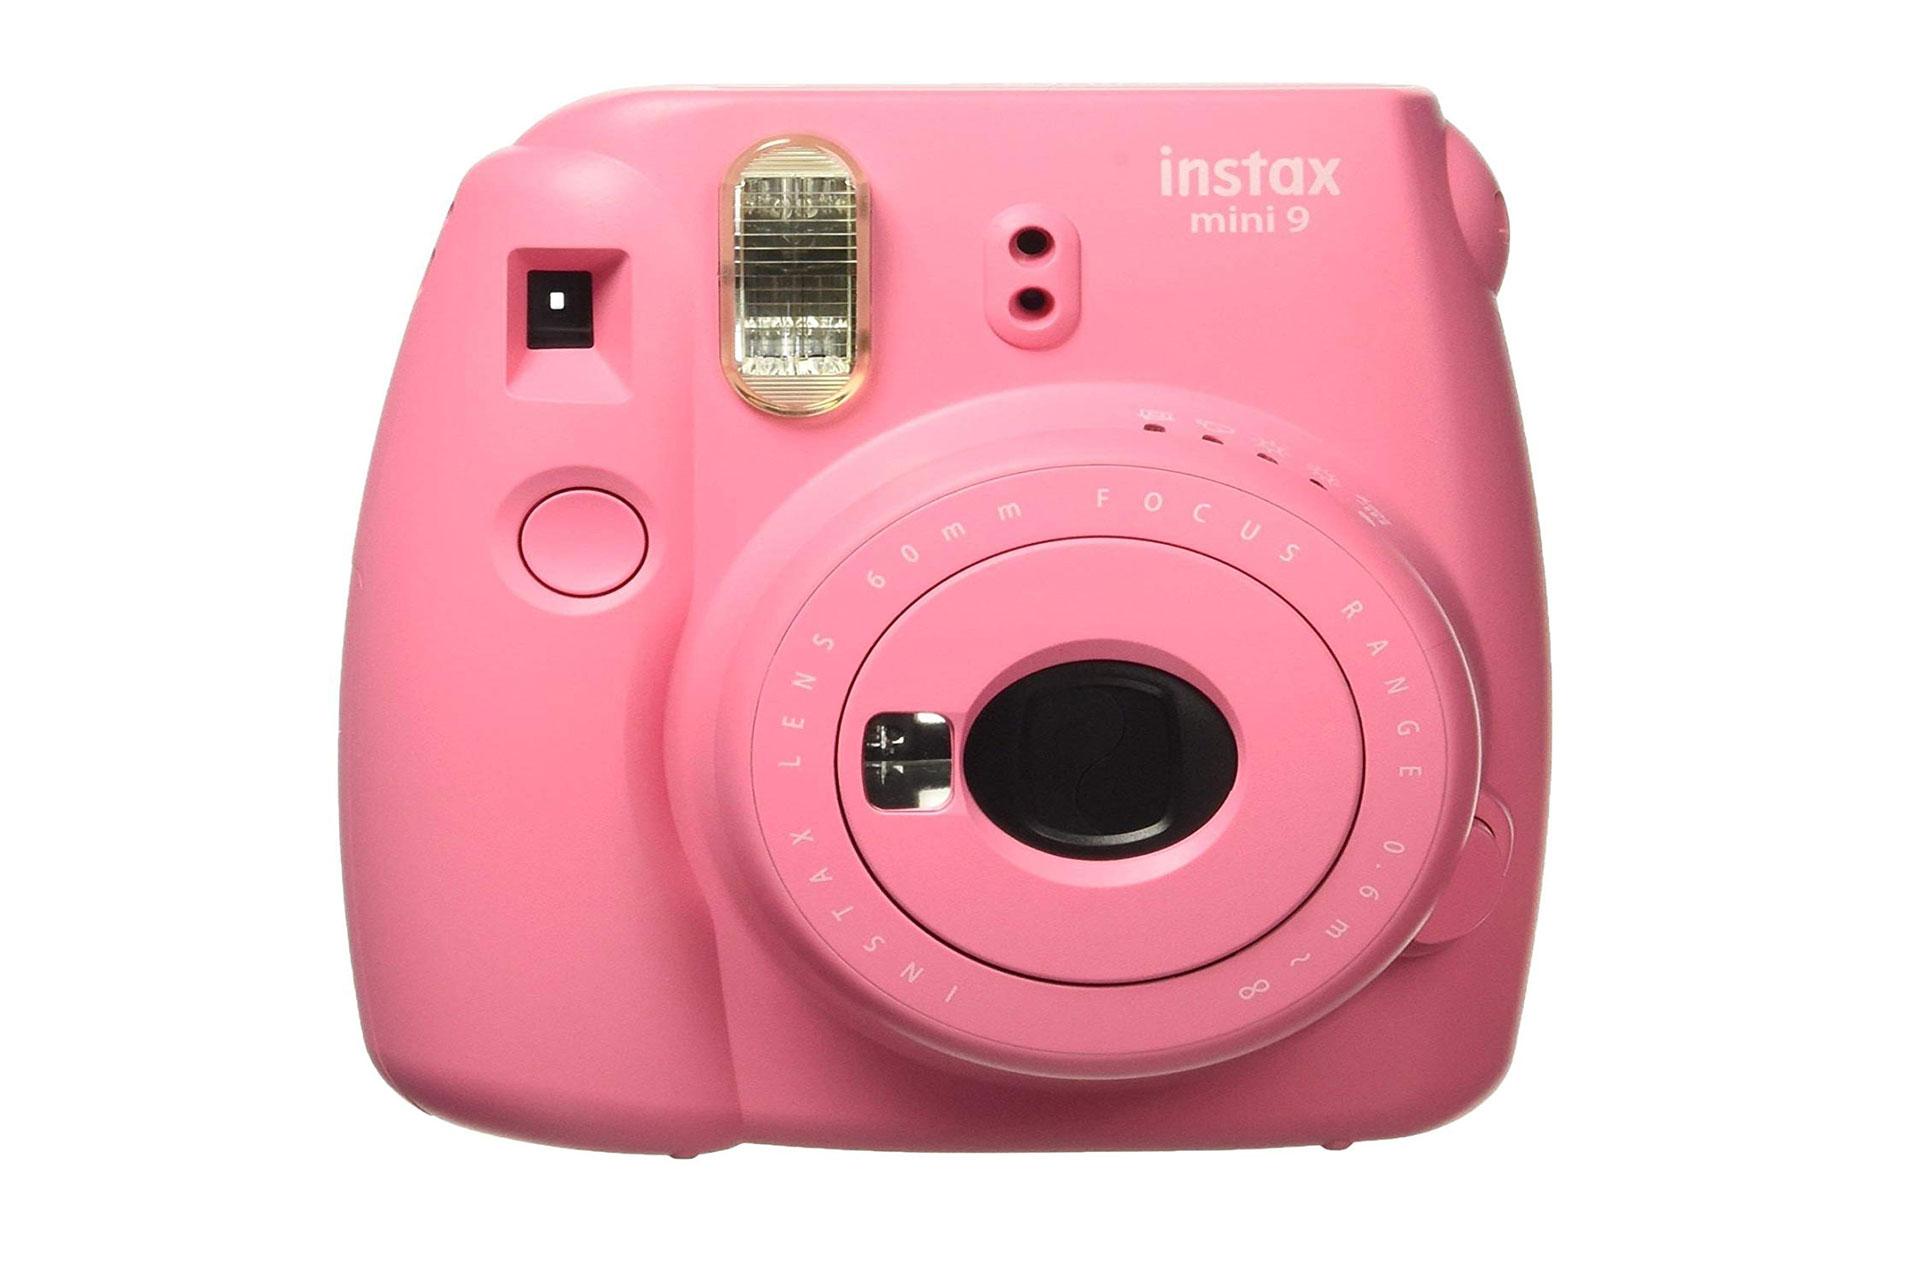 Fujifilm Instax Mini 9 Instant Camera; Courtesy of Amazon